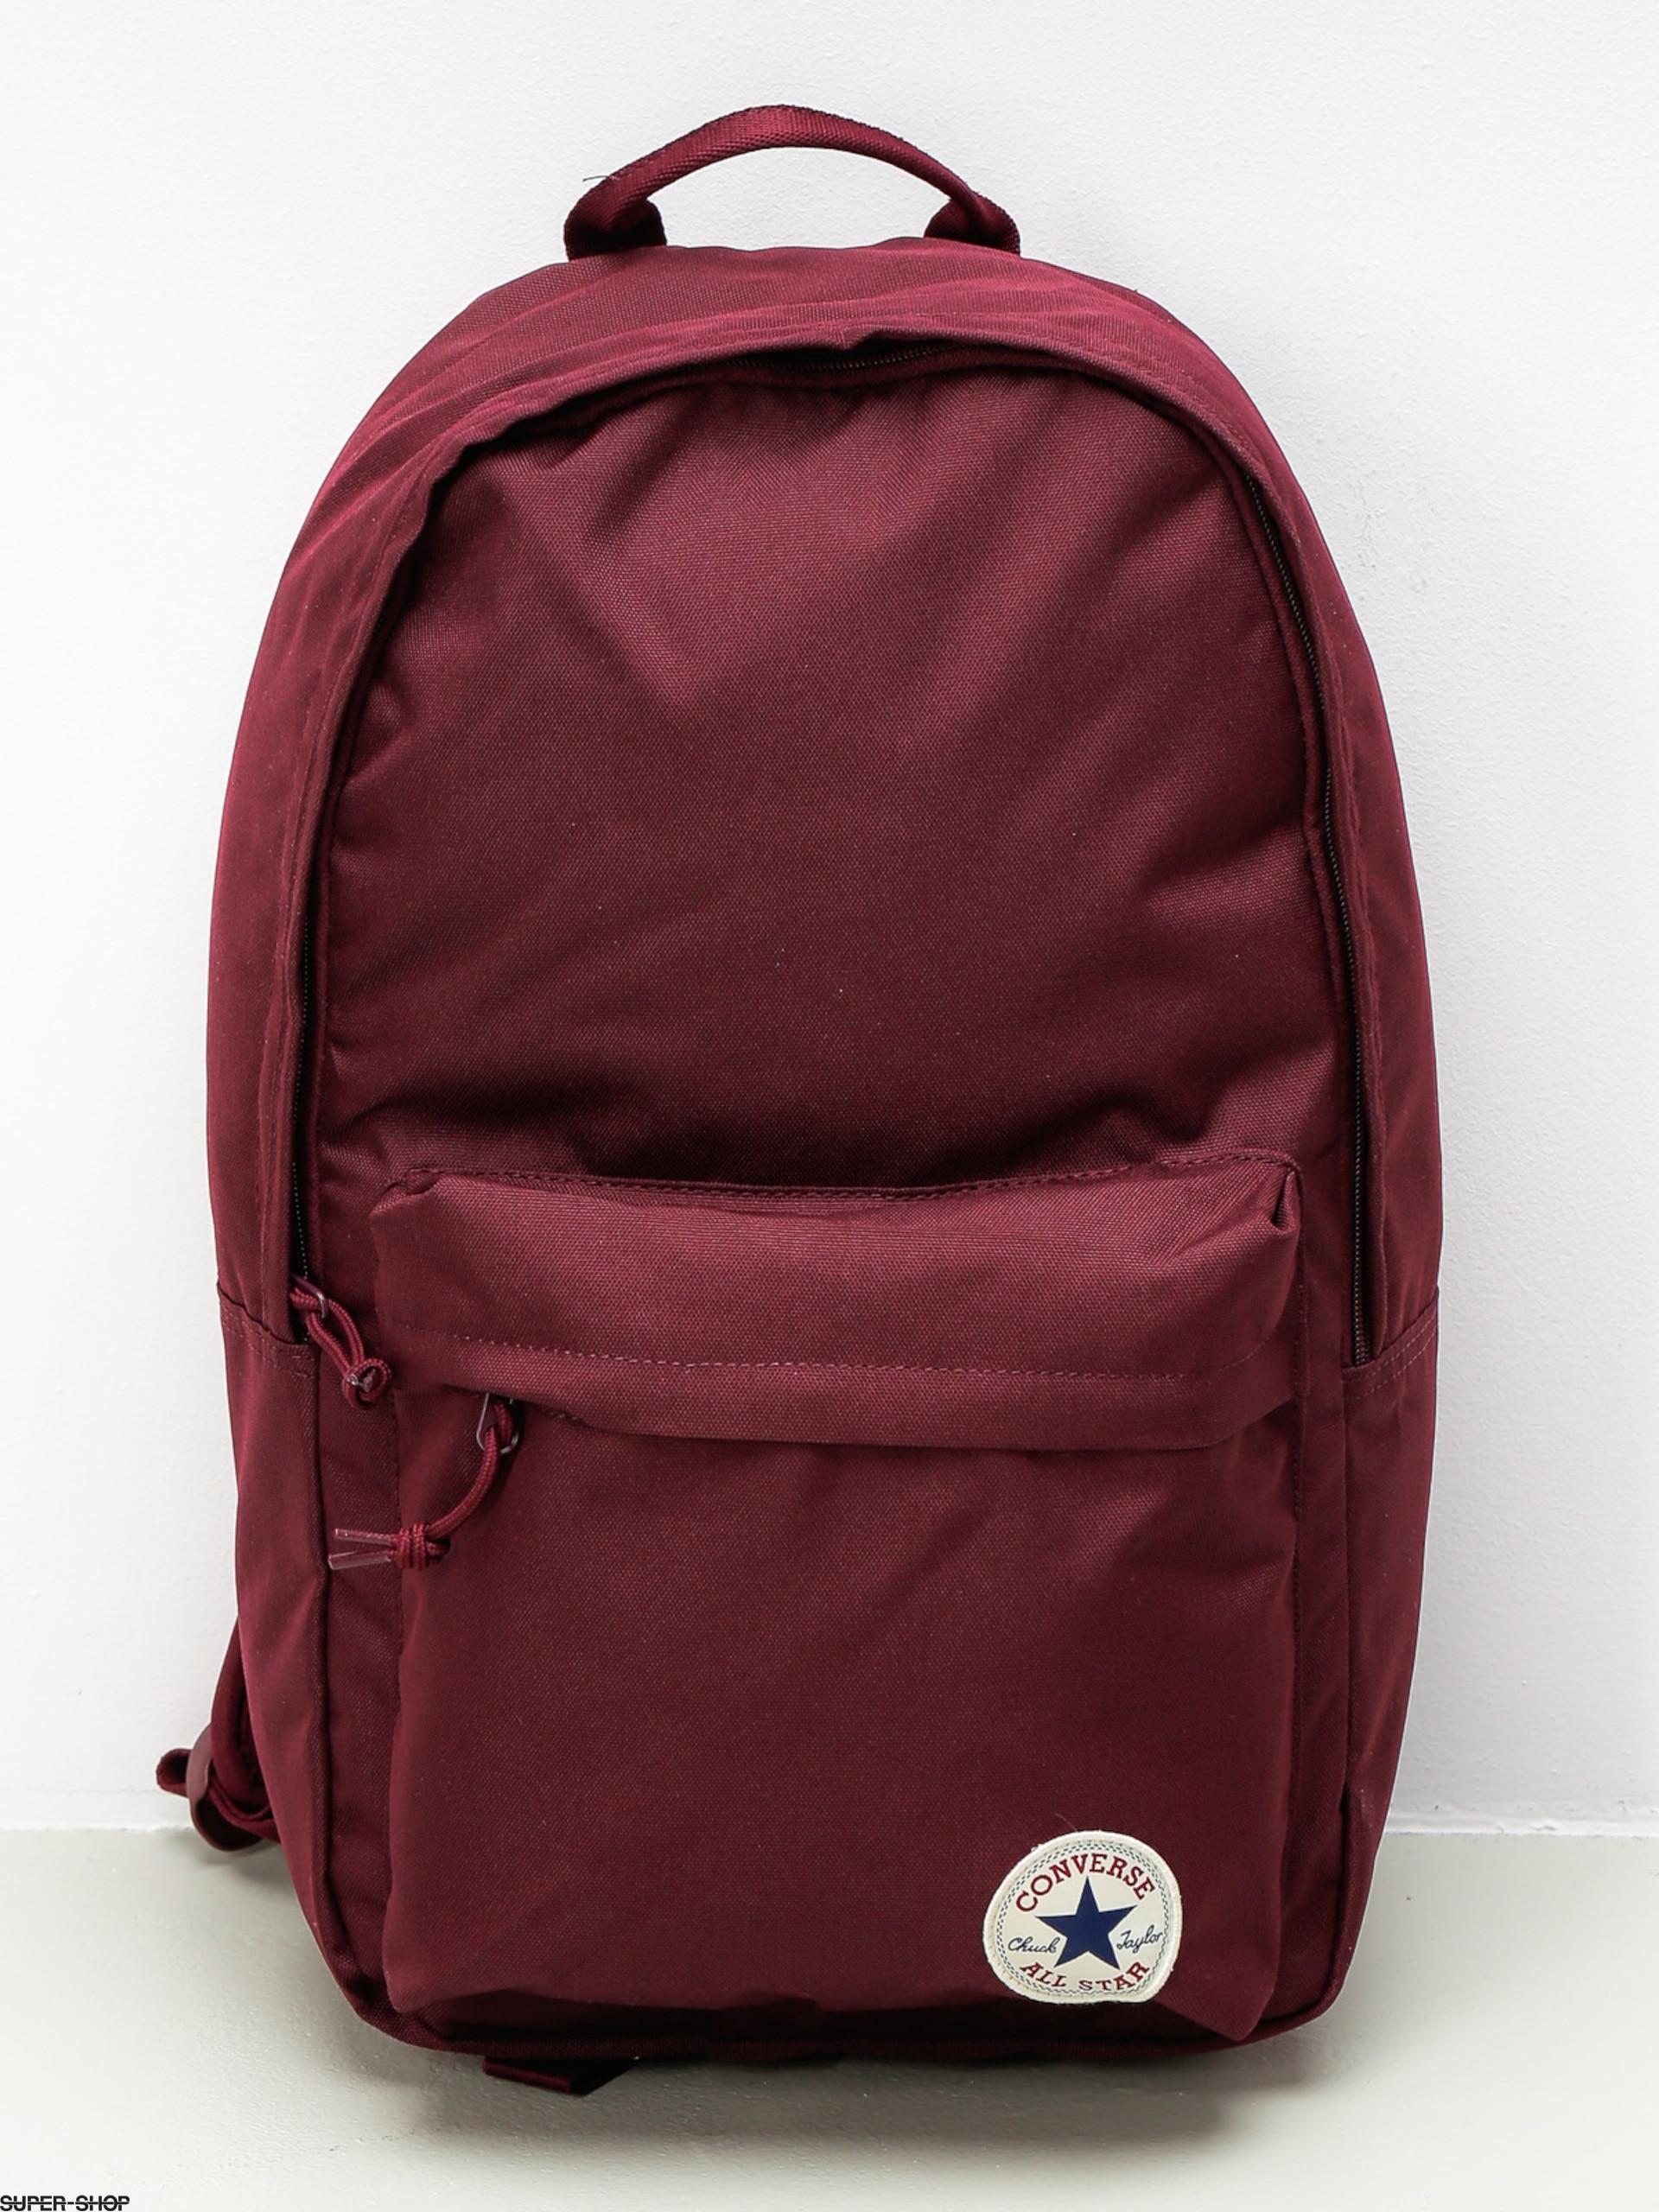 904524-w1920-converse-backpack-edc-poly-dark-sangria.jpg b1cf444291112